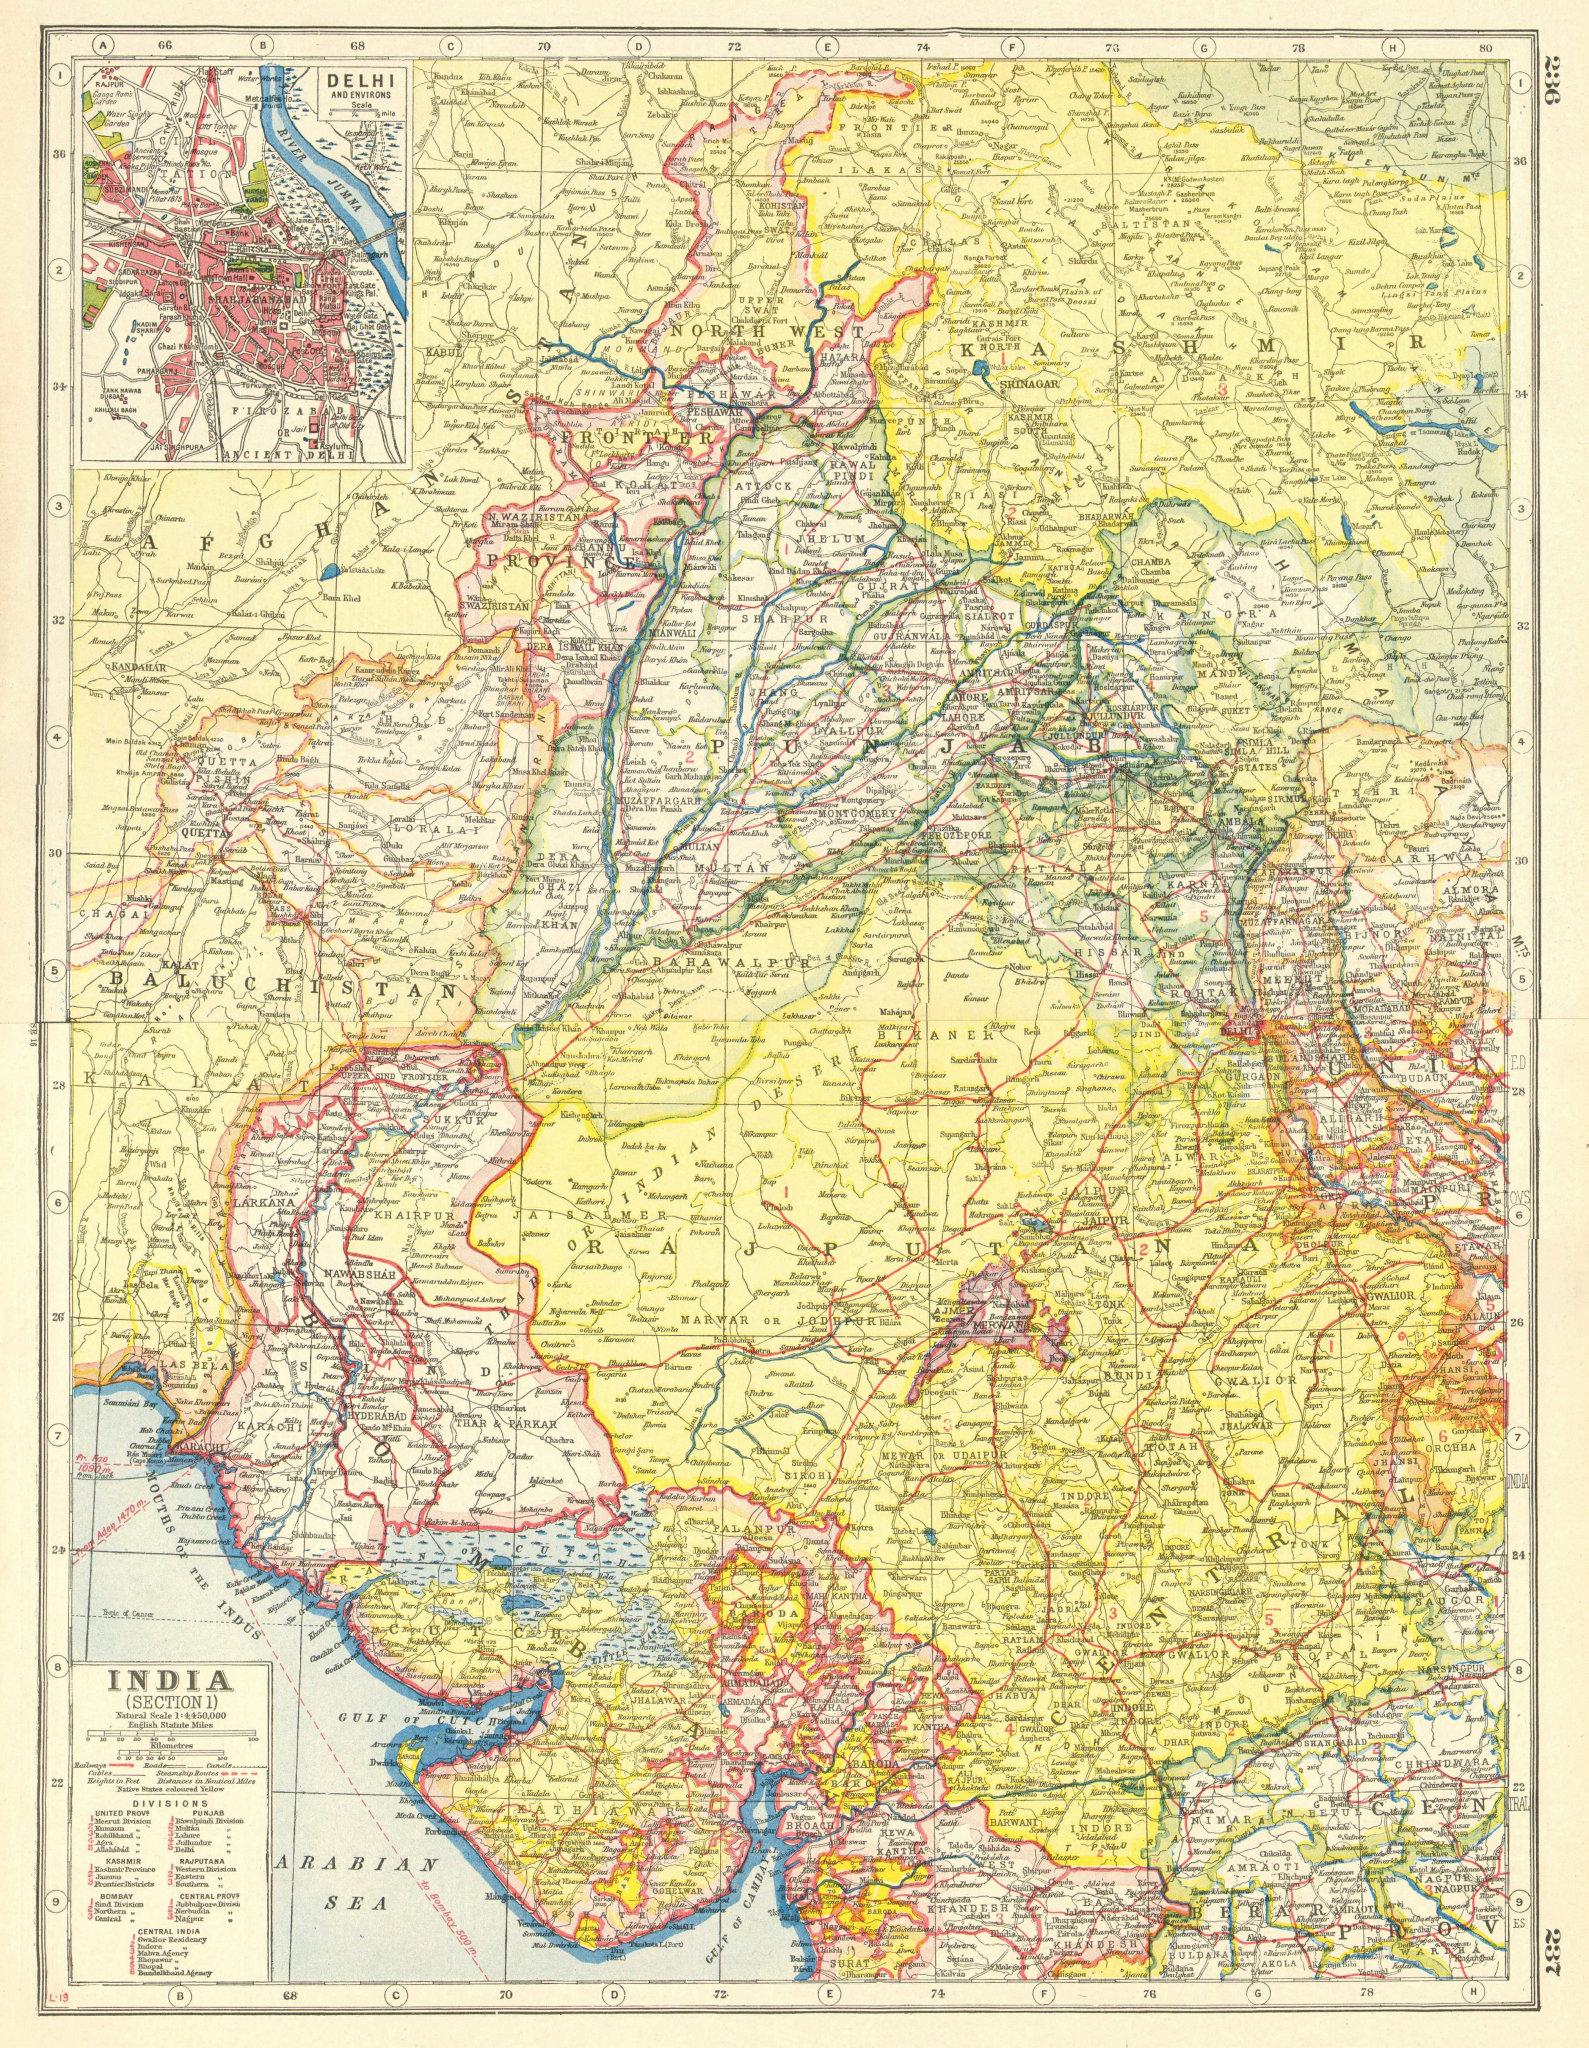 Associate Product BRITISH INDIA NW.Punjab Kashmir Rajputana Frontier.Delhi plan.Railways 1920 map